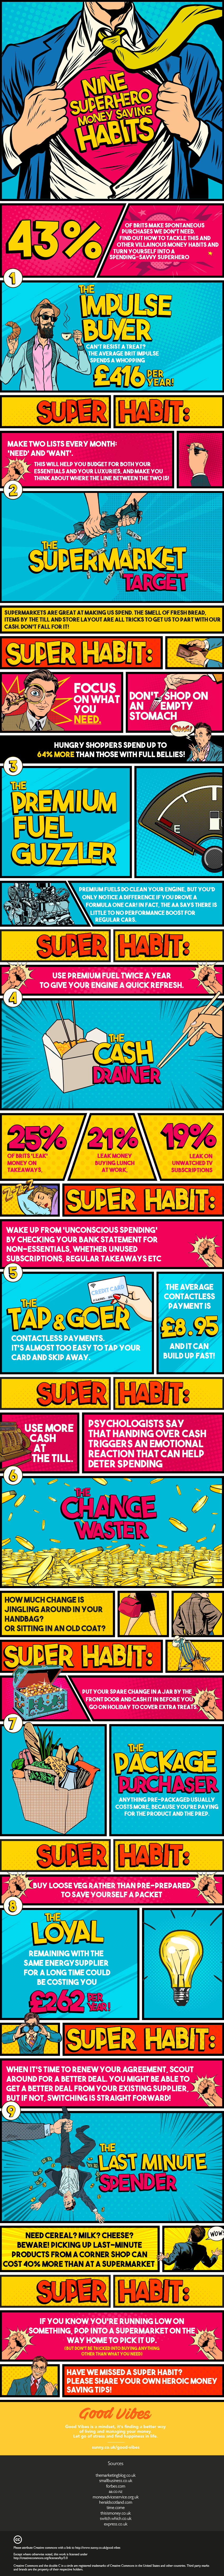 How to Become a Money-Saving Superhero - Infographic